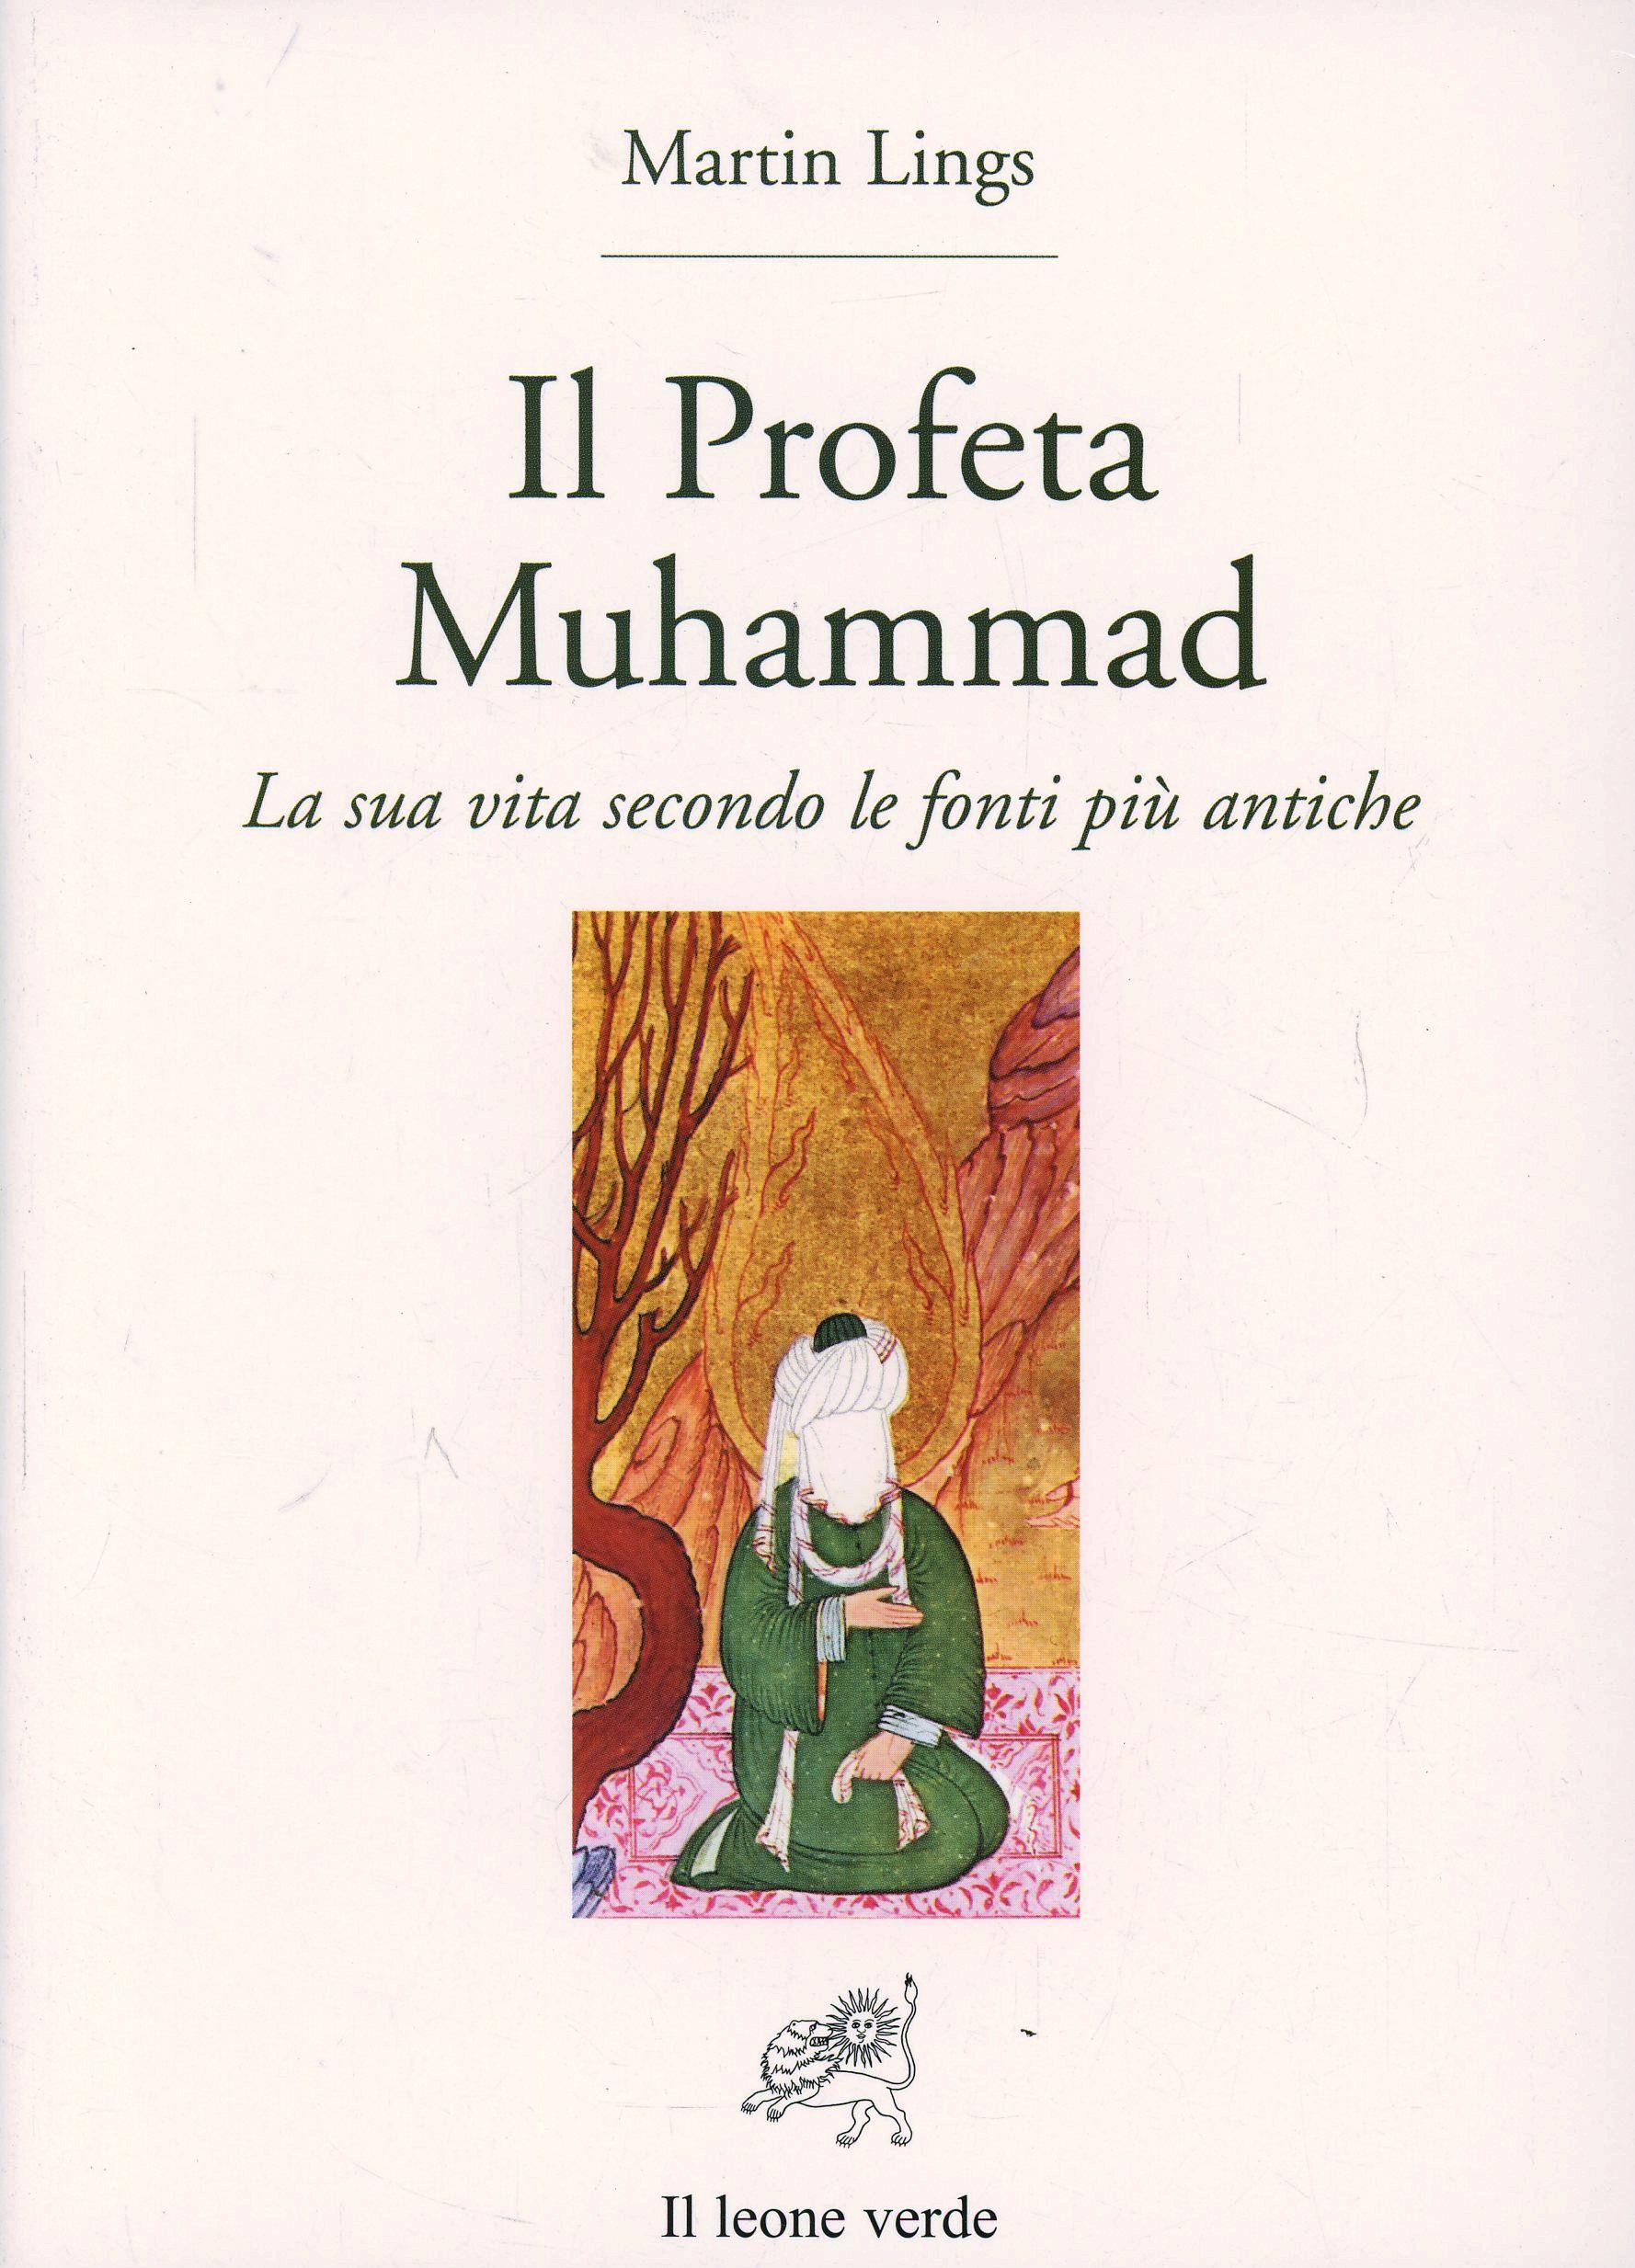 Il Profeta Muhammad_Martin Lings